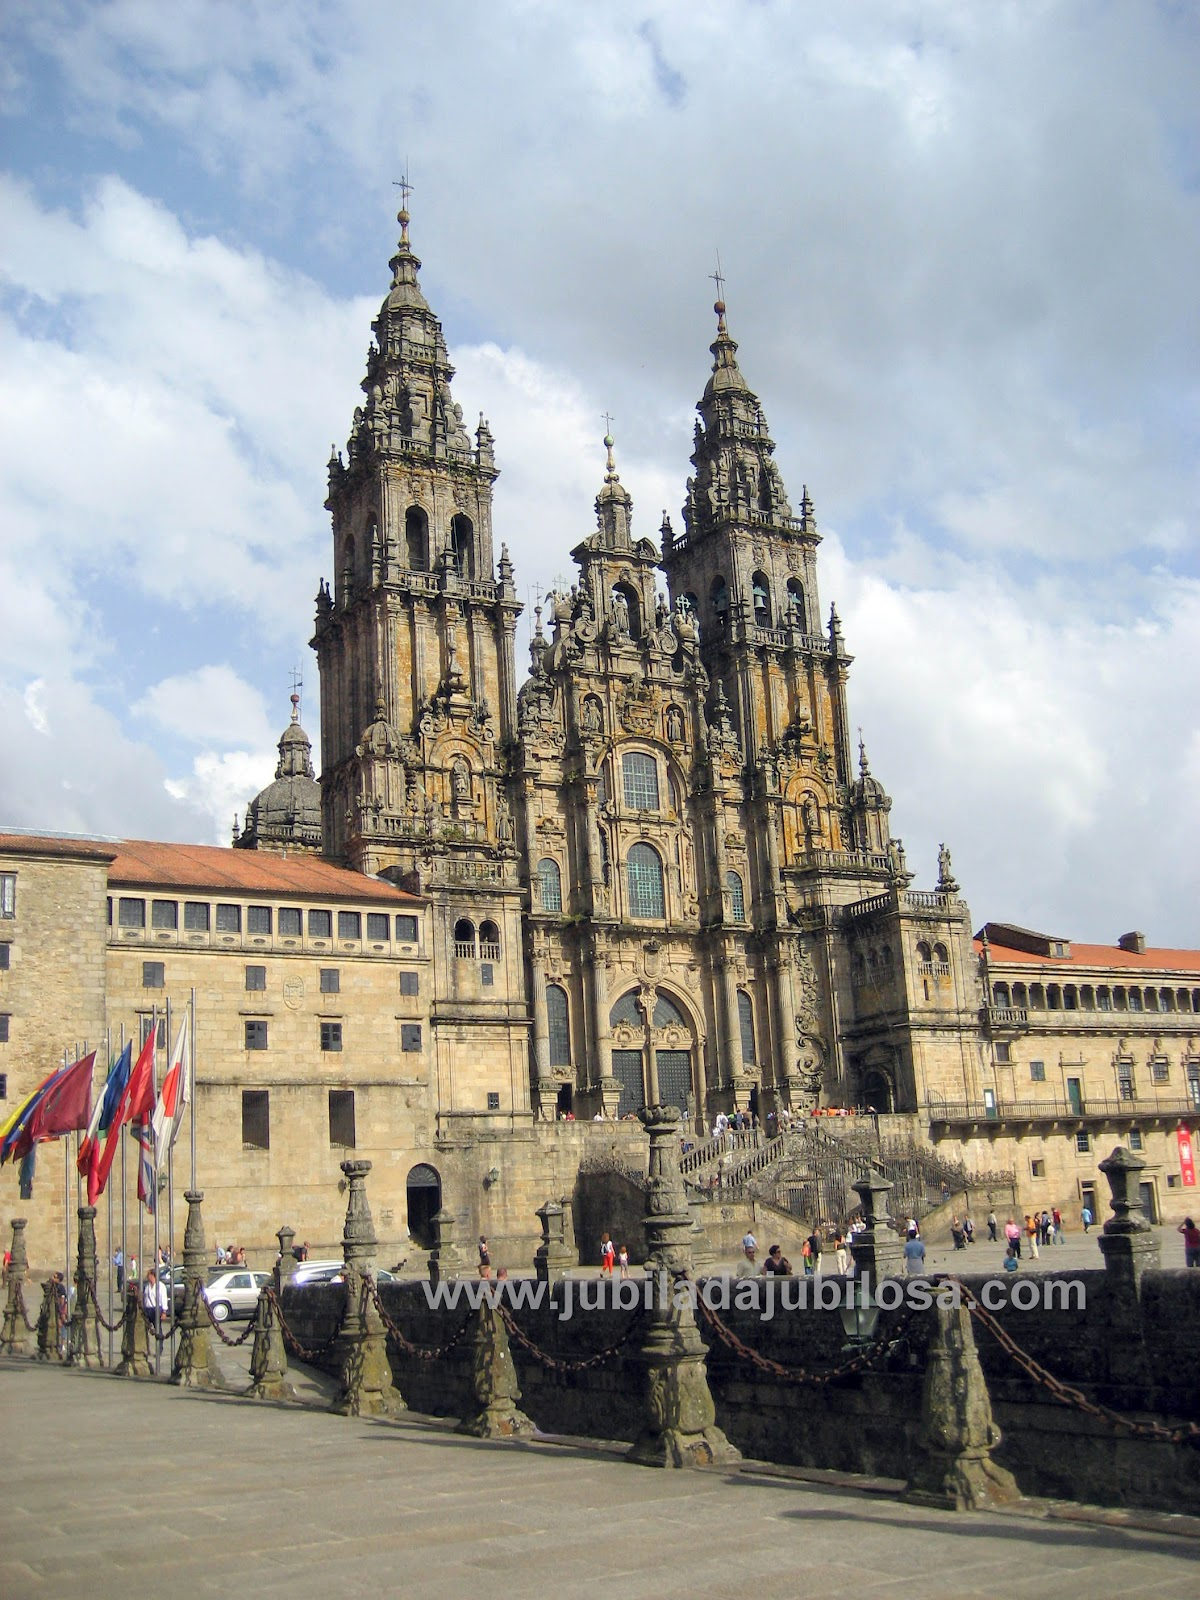 Jubilada jubilosa tejados de catedrales de mil n a for Oficina de turismo de santiago de compostela